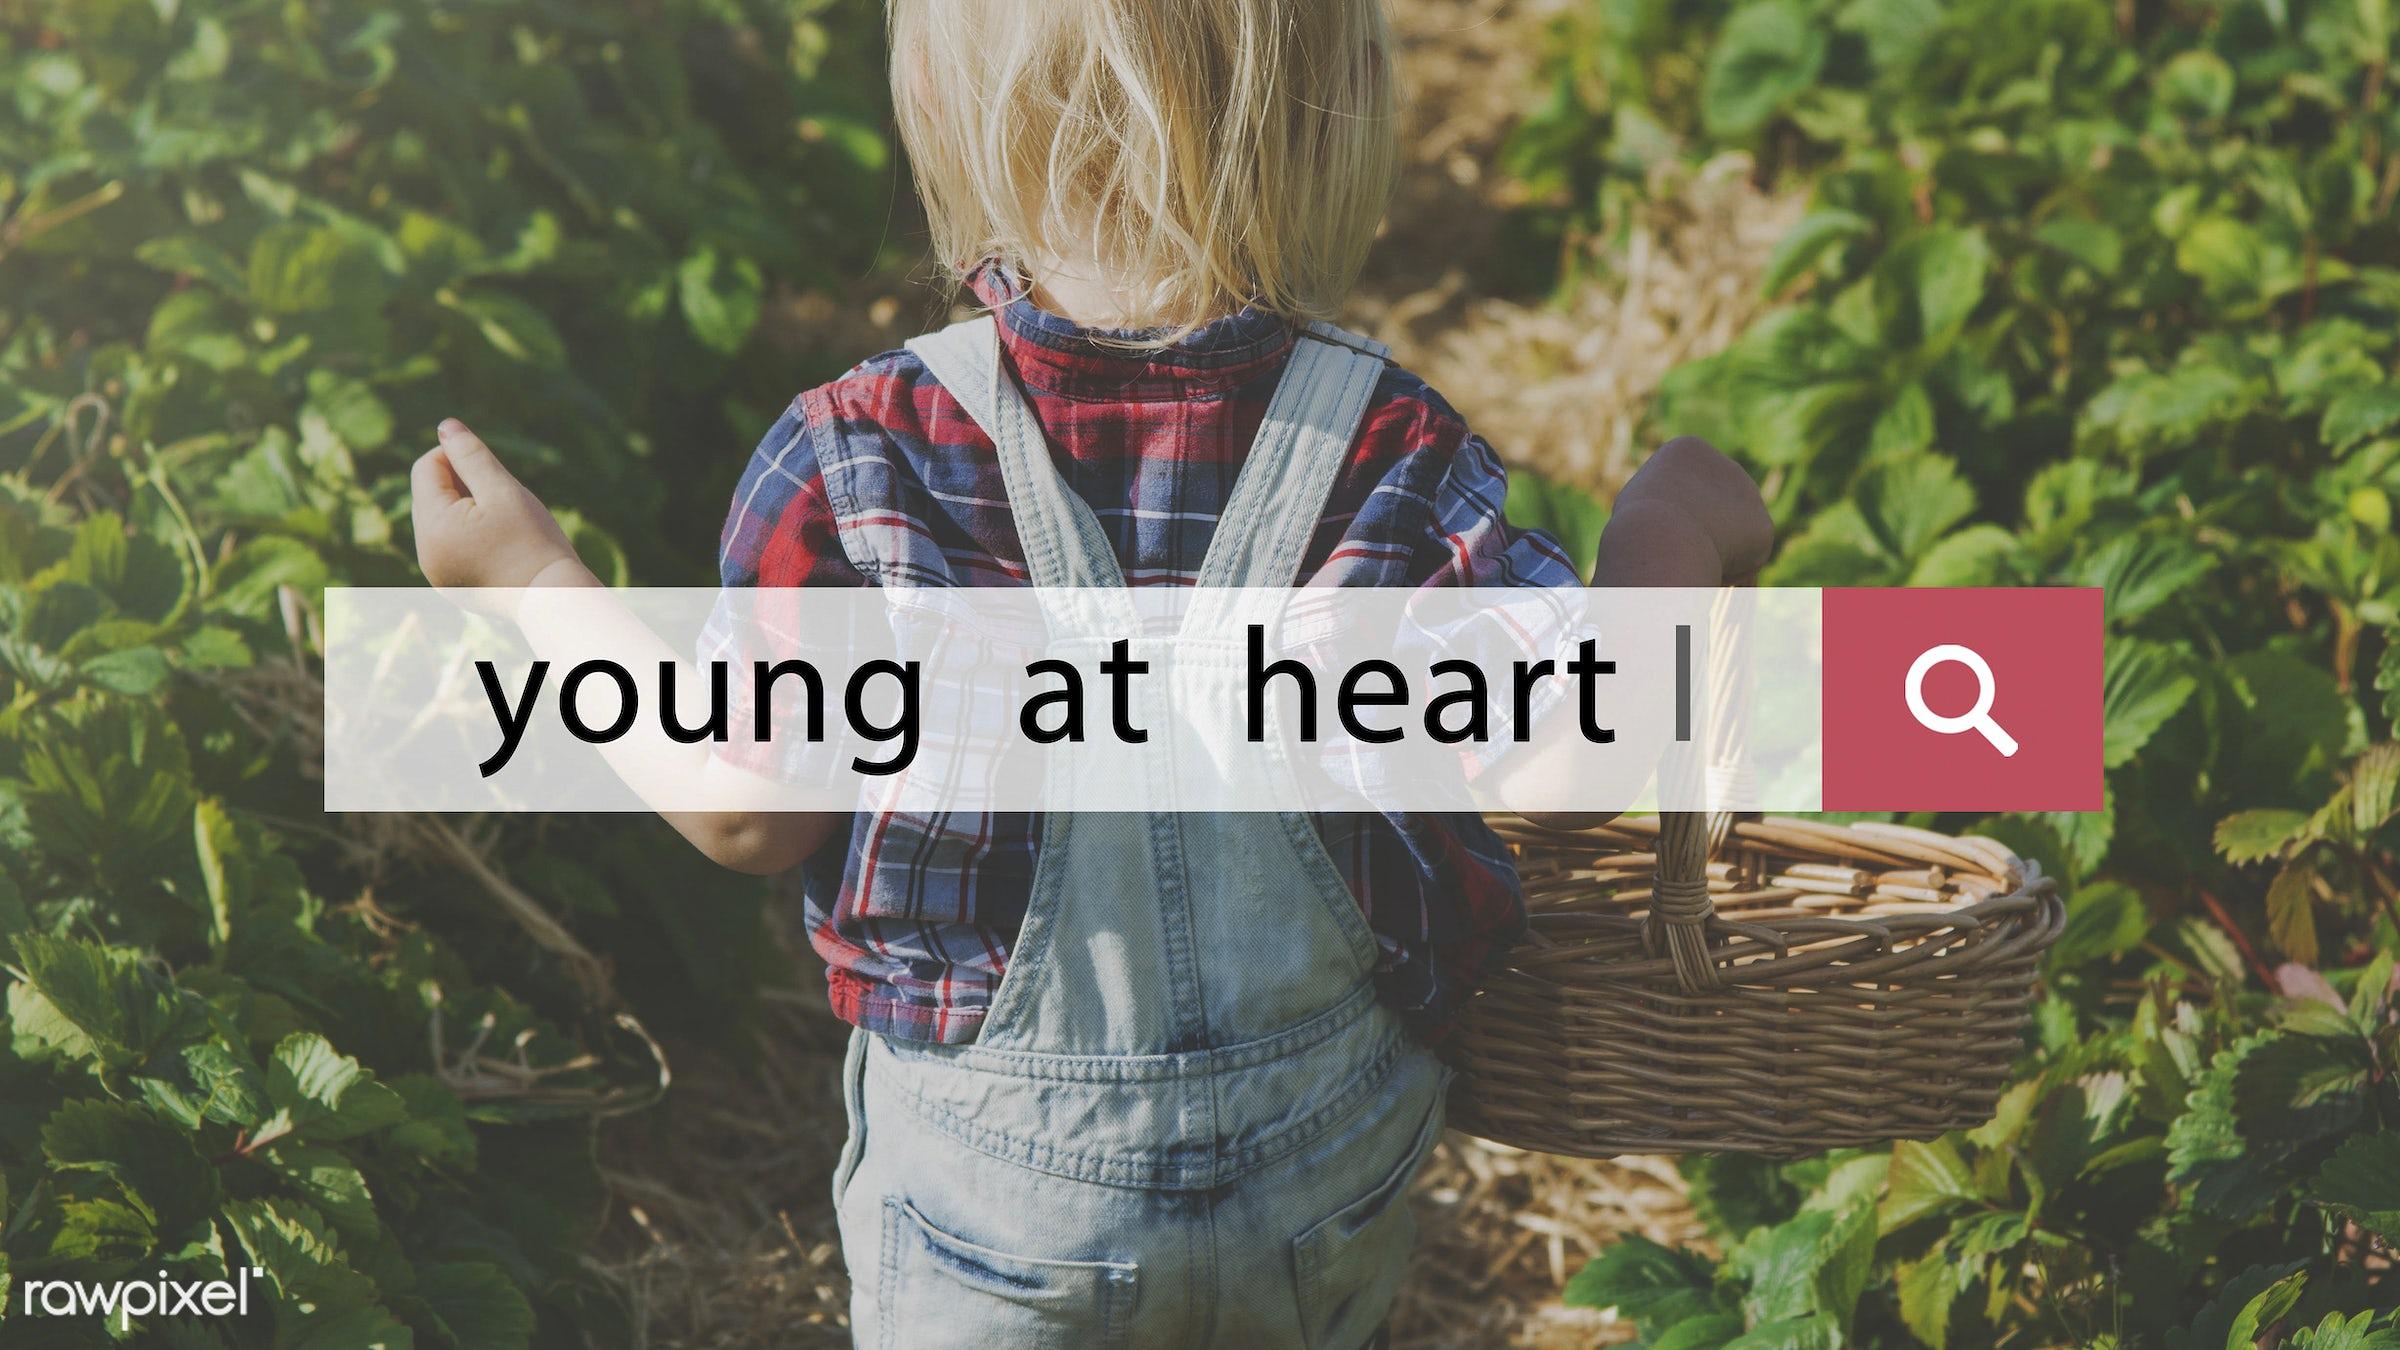 appreciate, basket, blonde, boy, caucasian, childhood, delightful, dungarees, enjoy, enjoy life, enjoyment, farm, fruit, fun...